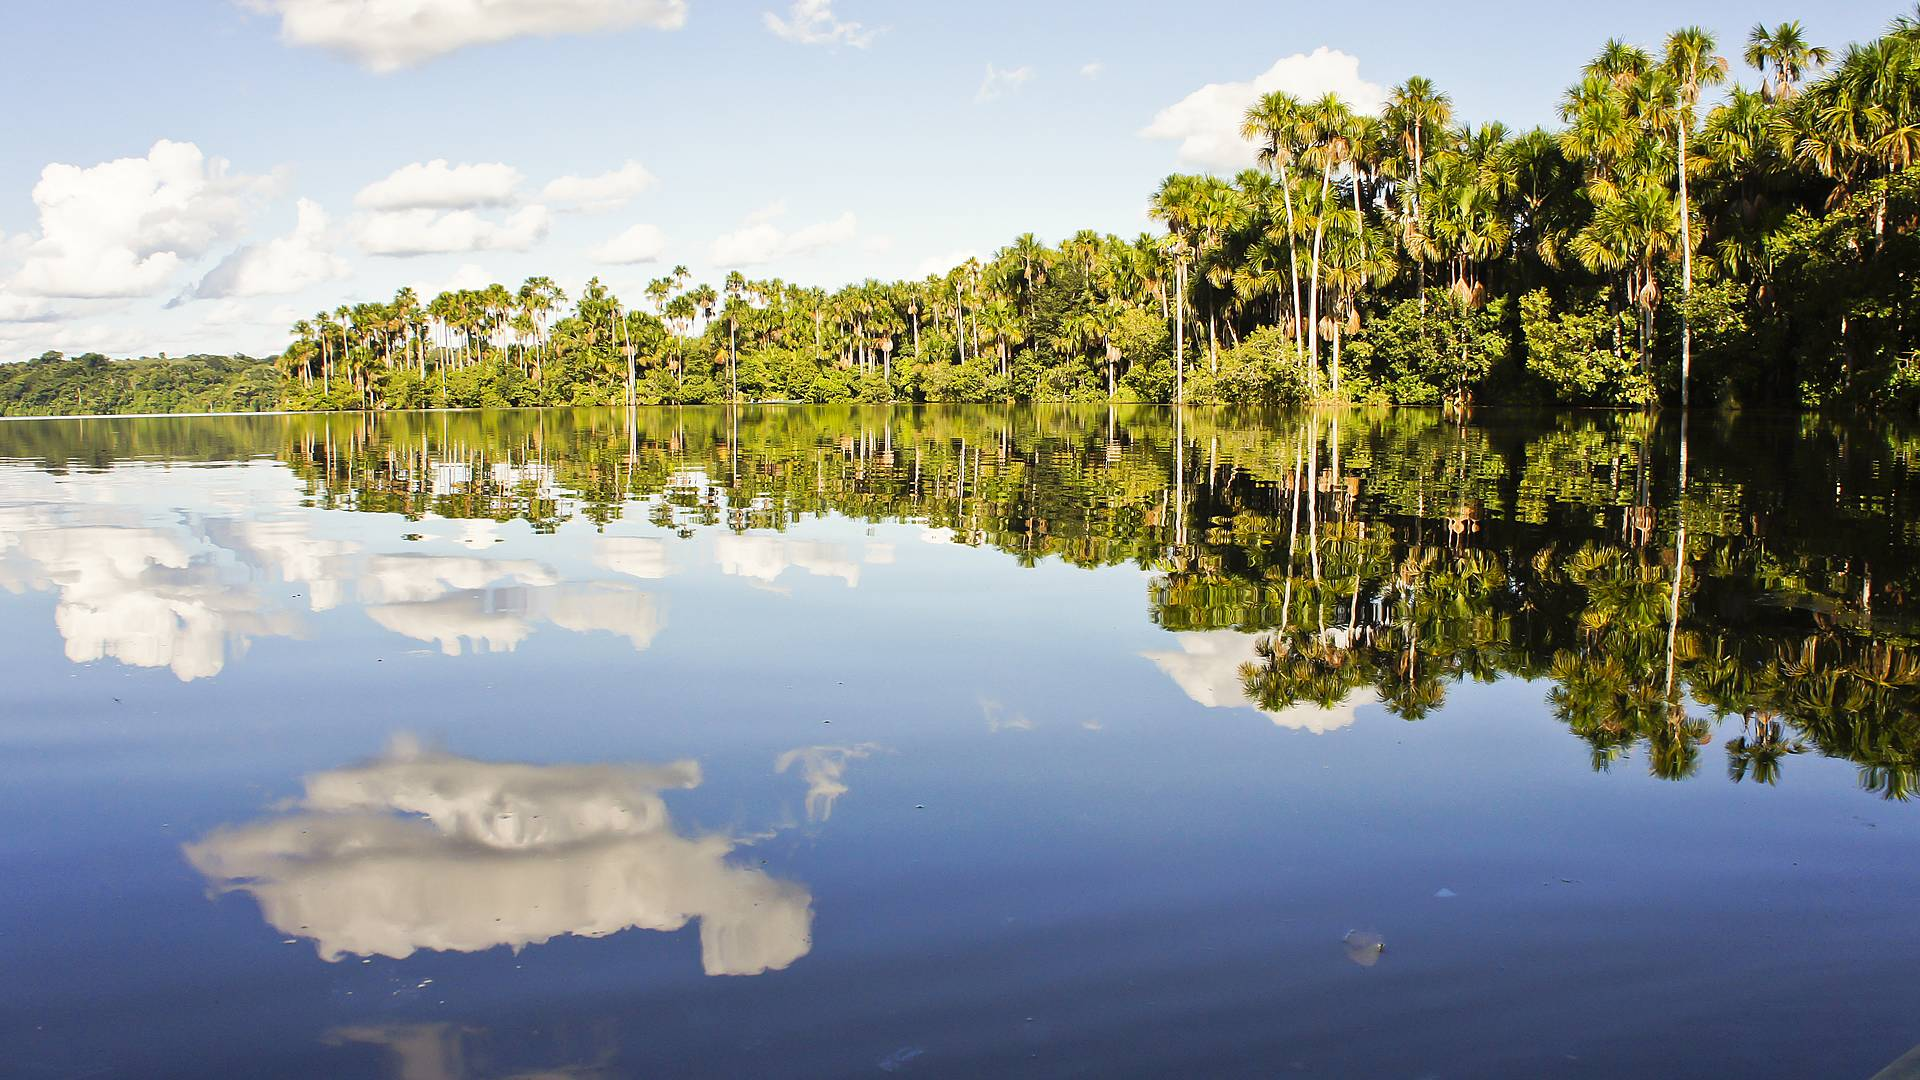 Terres sacrées et Amazonie